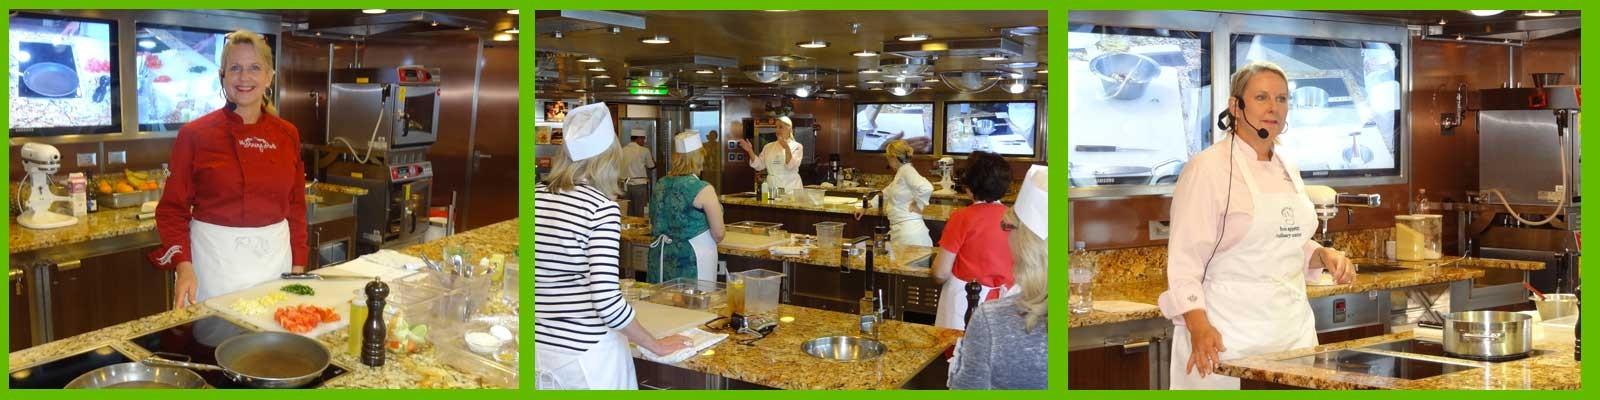 Culinary Instruction